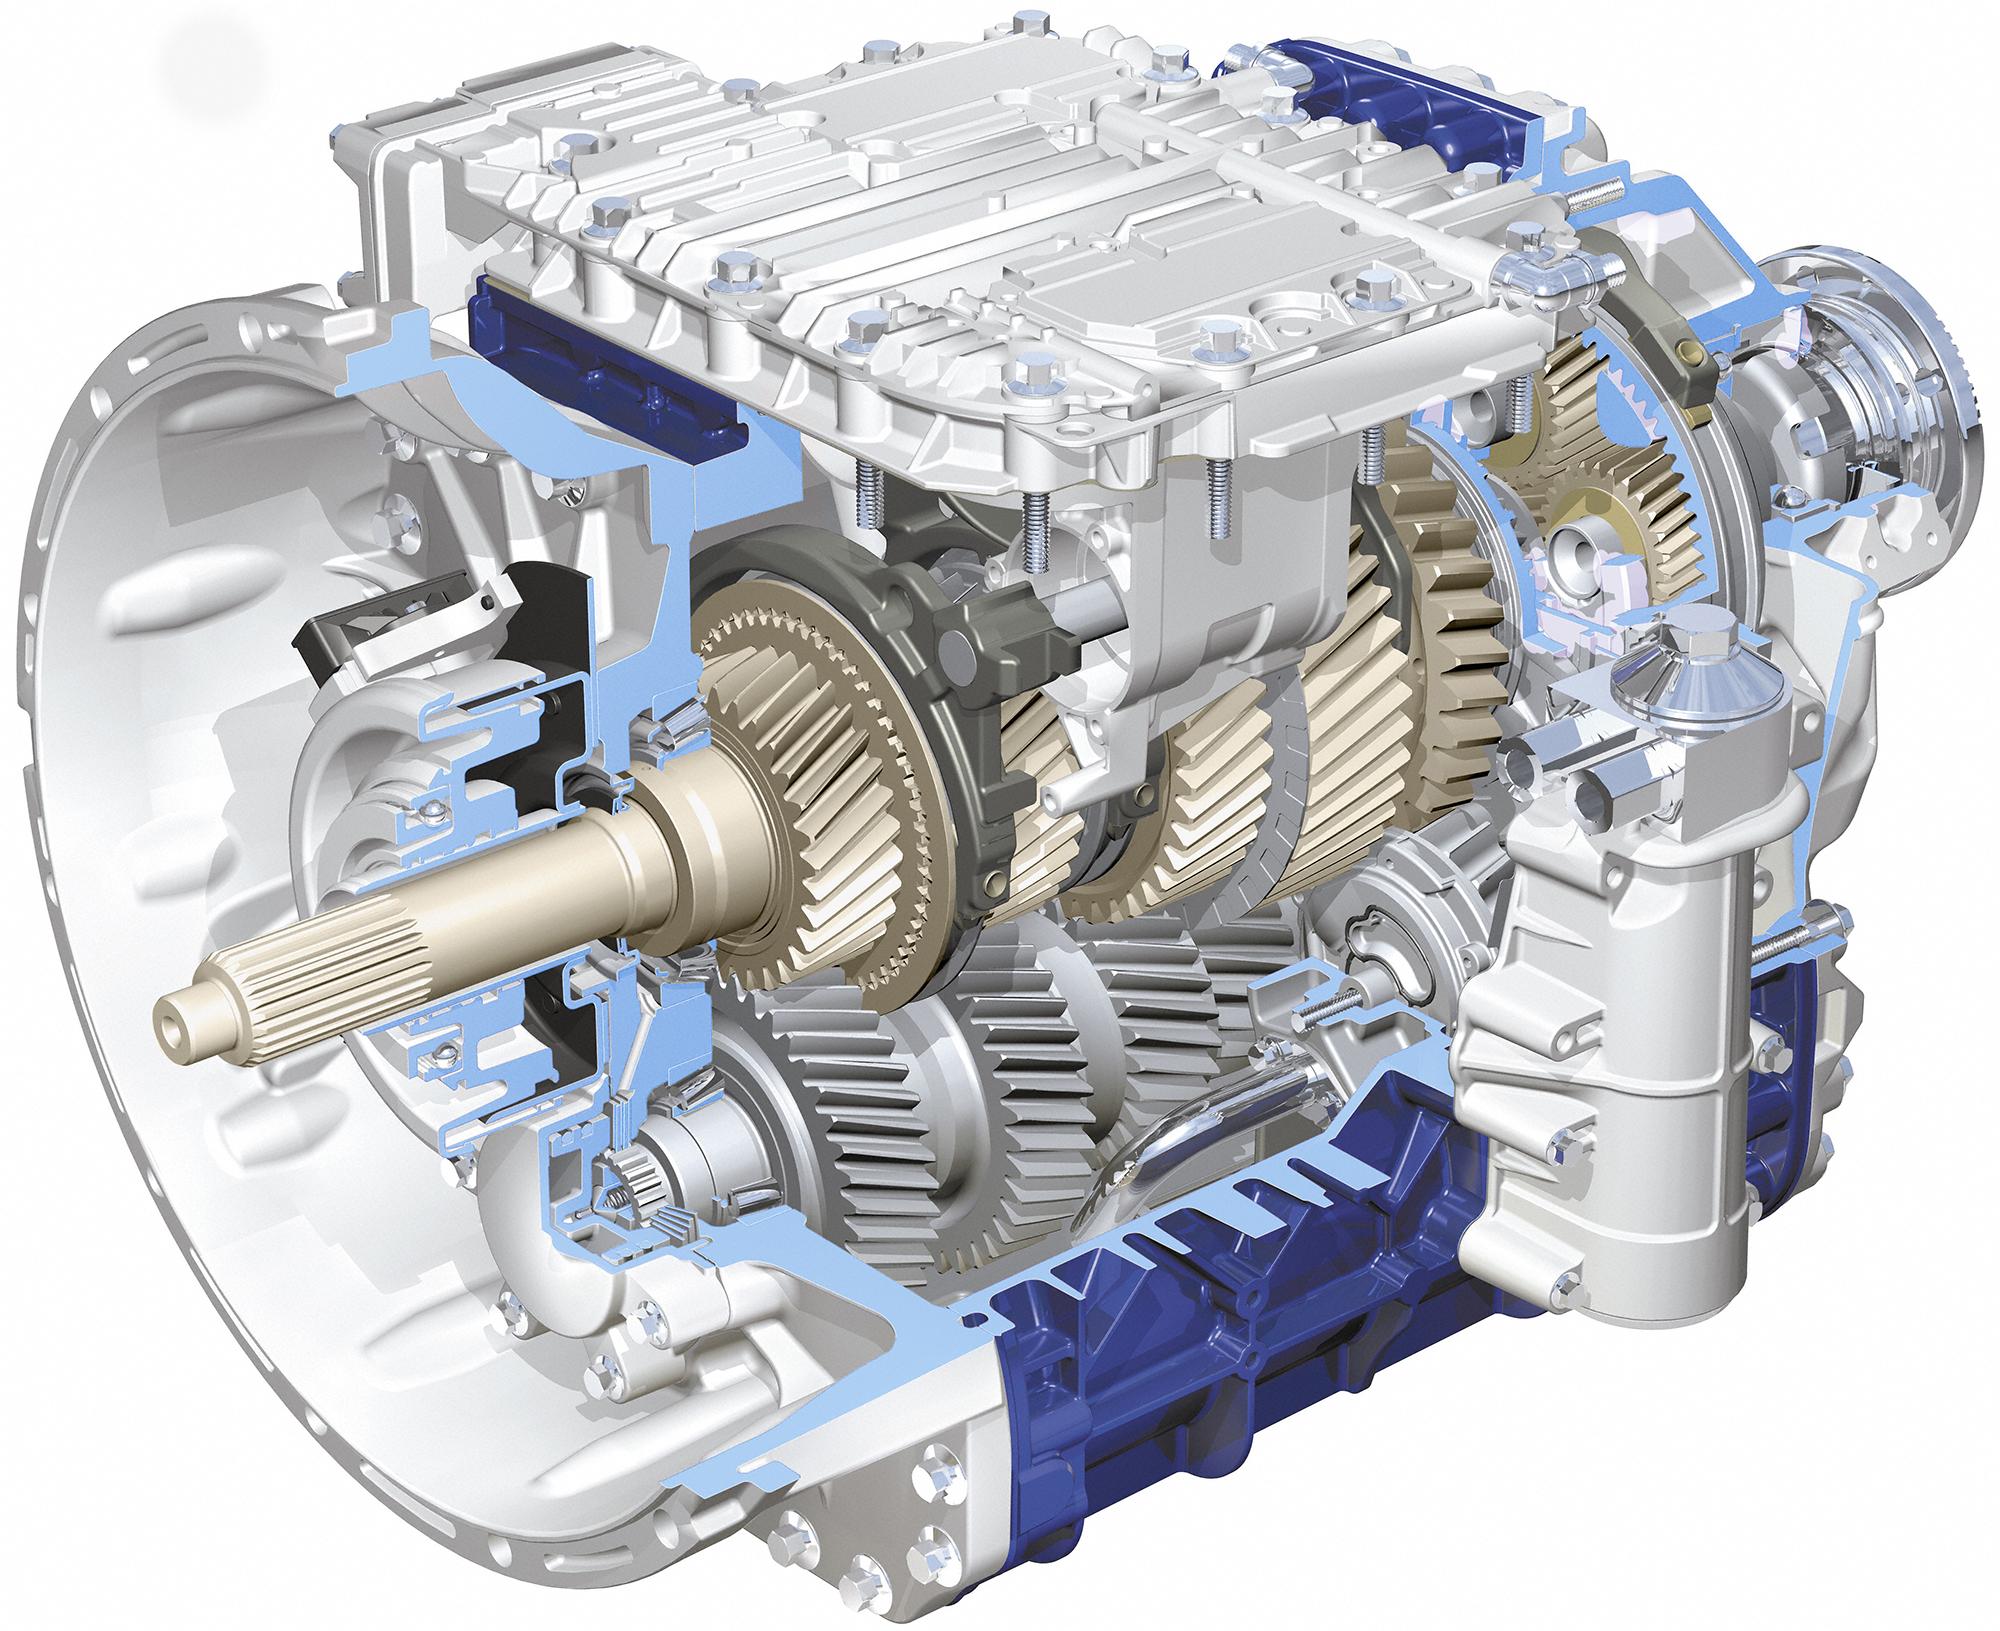 hight resolution of volvo truck engine diagram wiring diagram expert volvo truck engine diagram volvo truck engine diagram